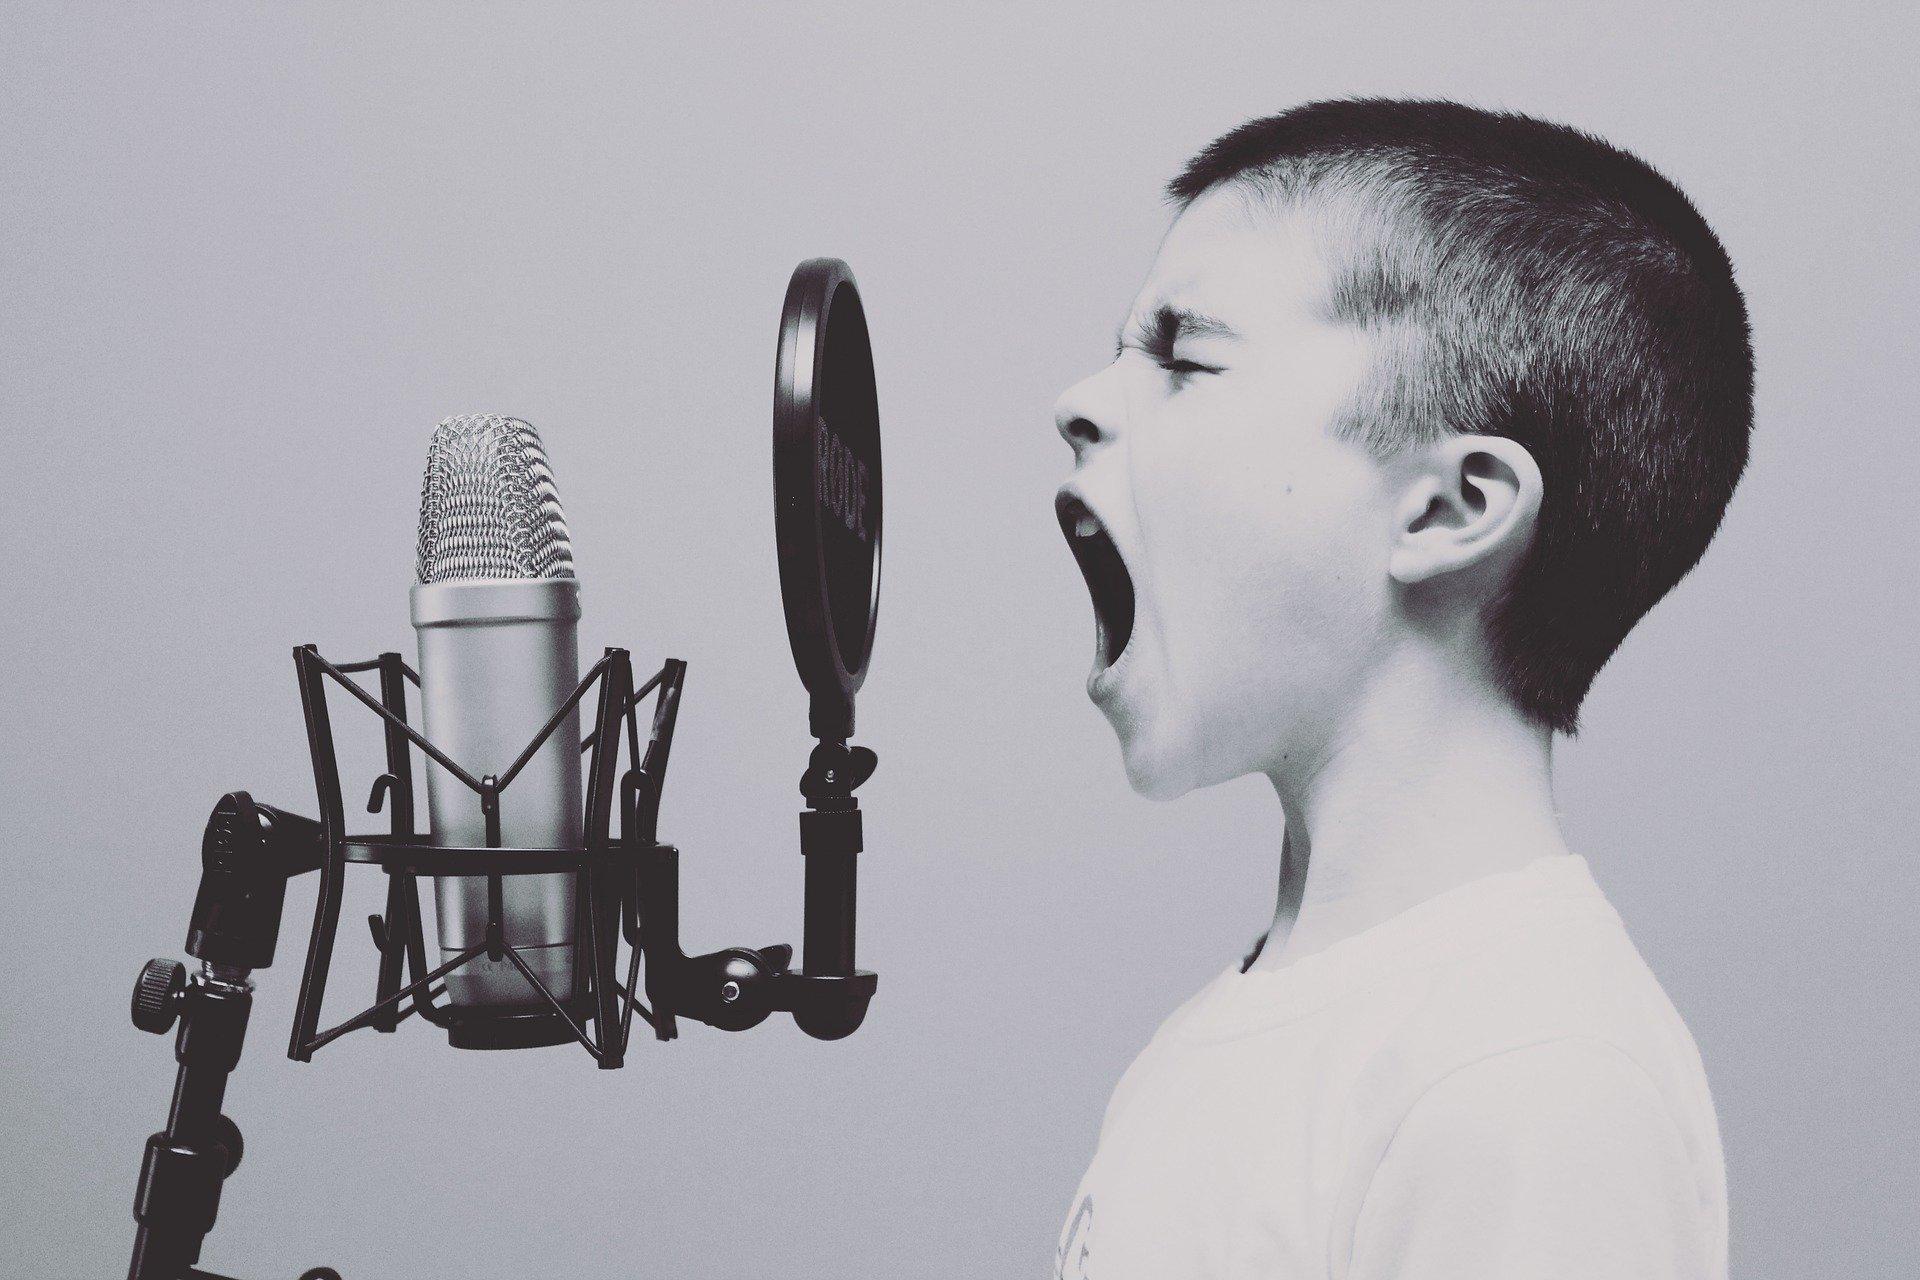 microphone 1209816 1920